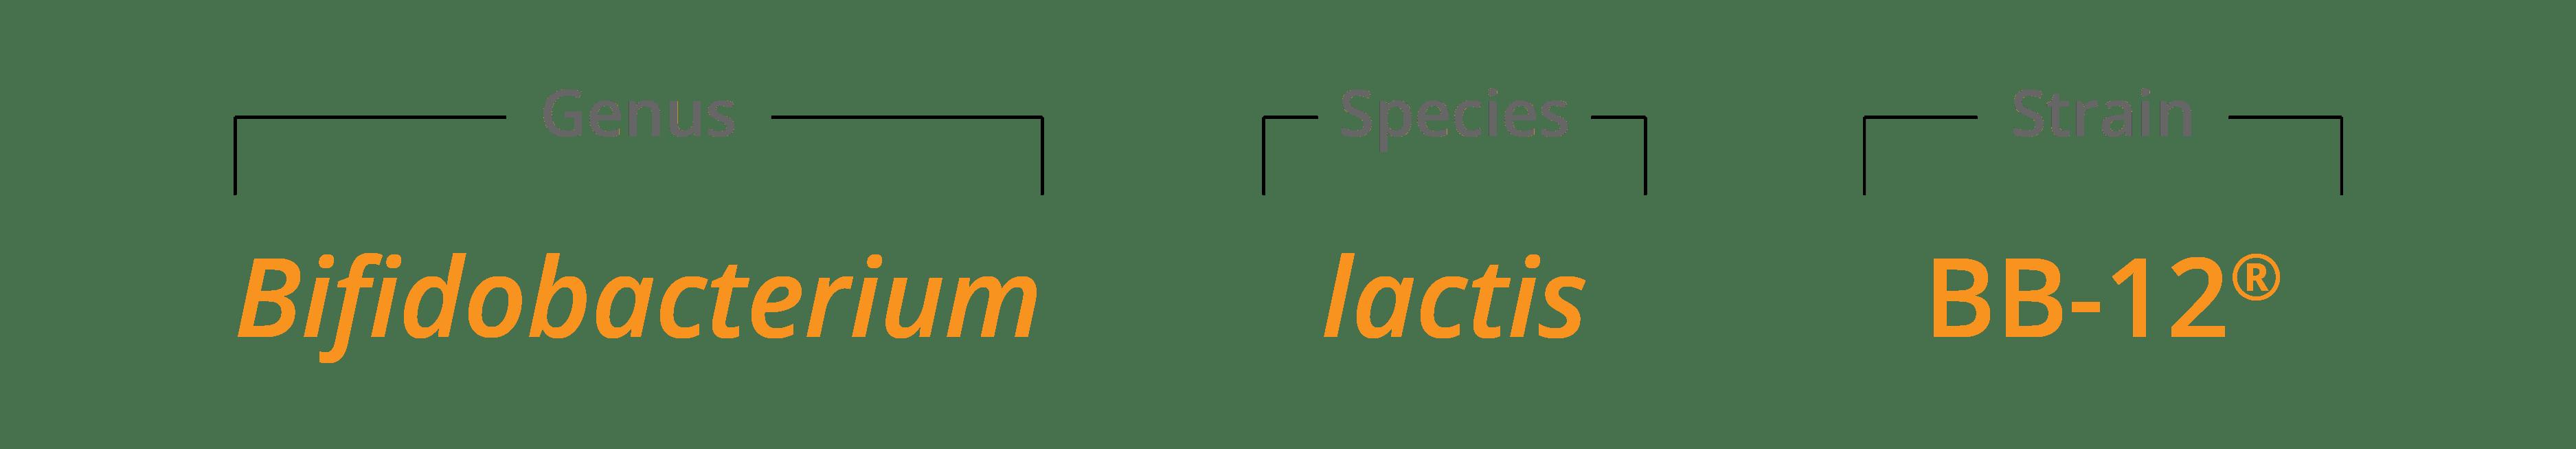 B lactis BB-12 Genus species & strain